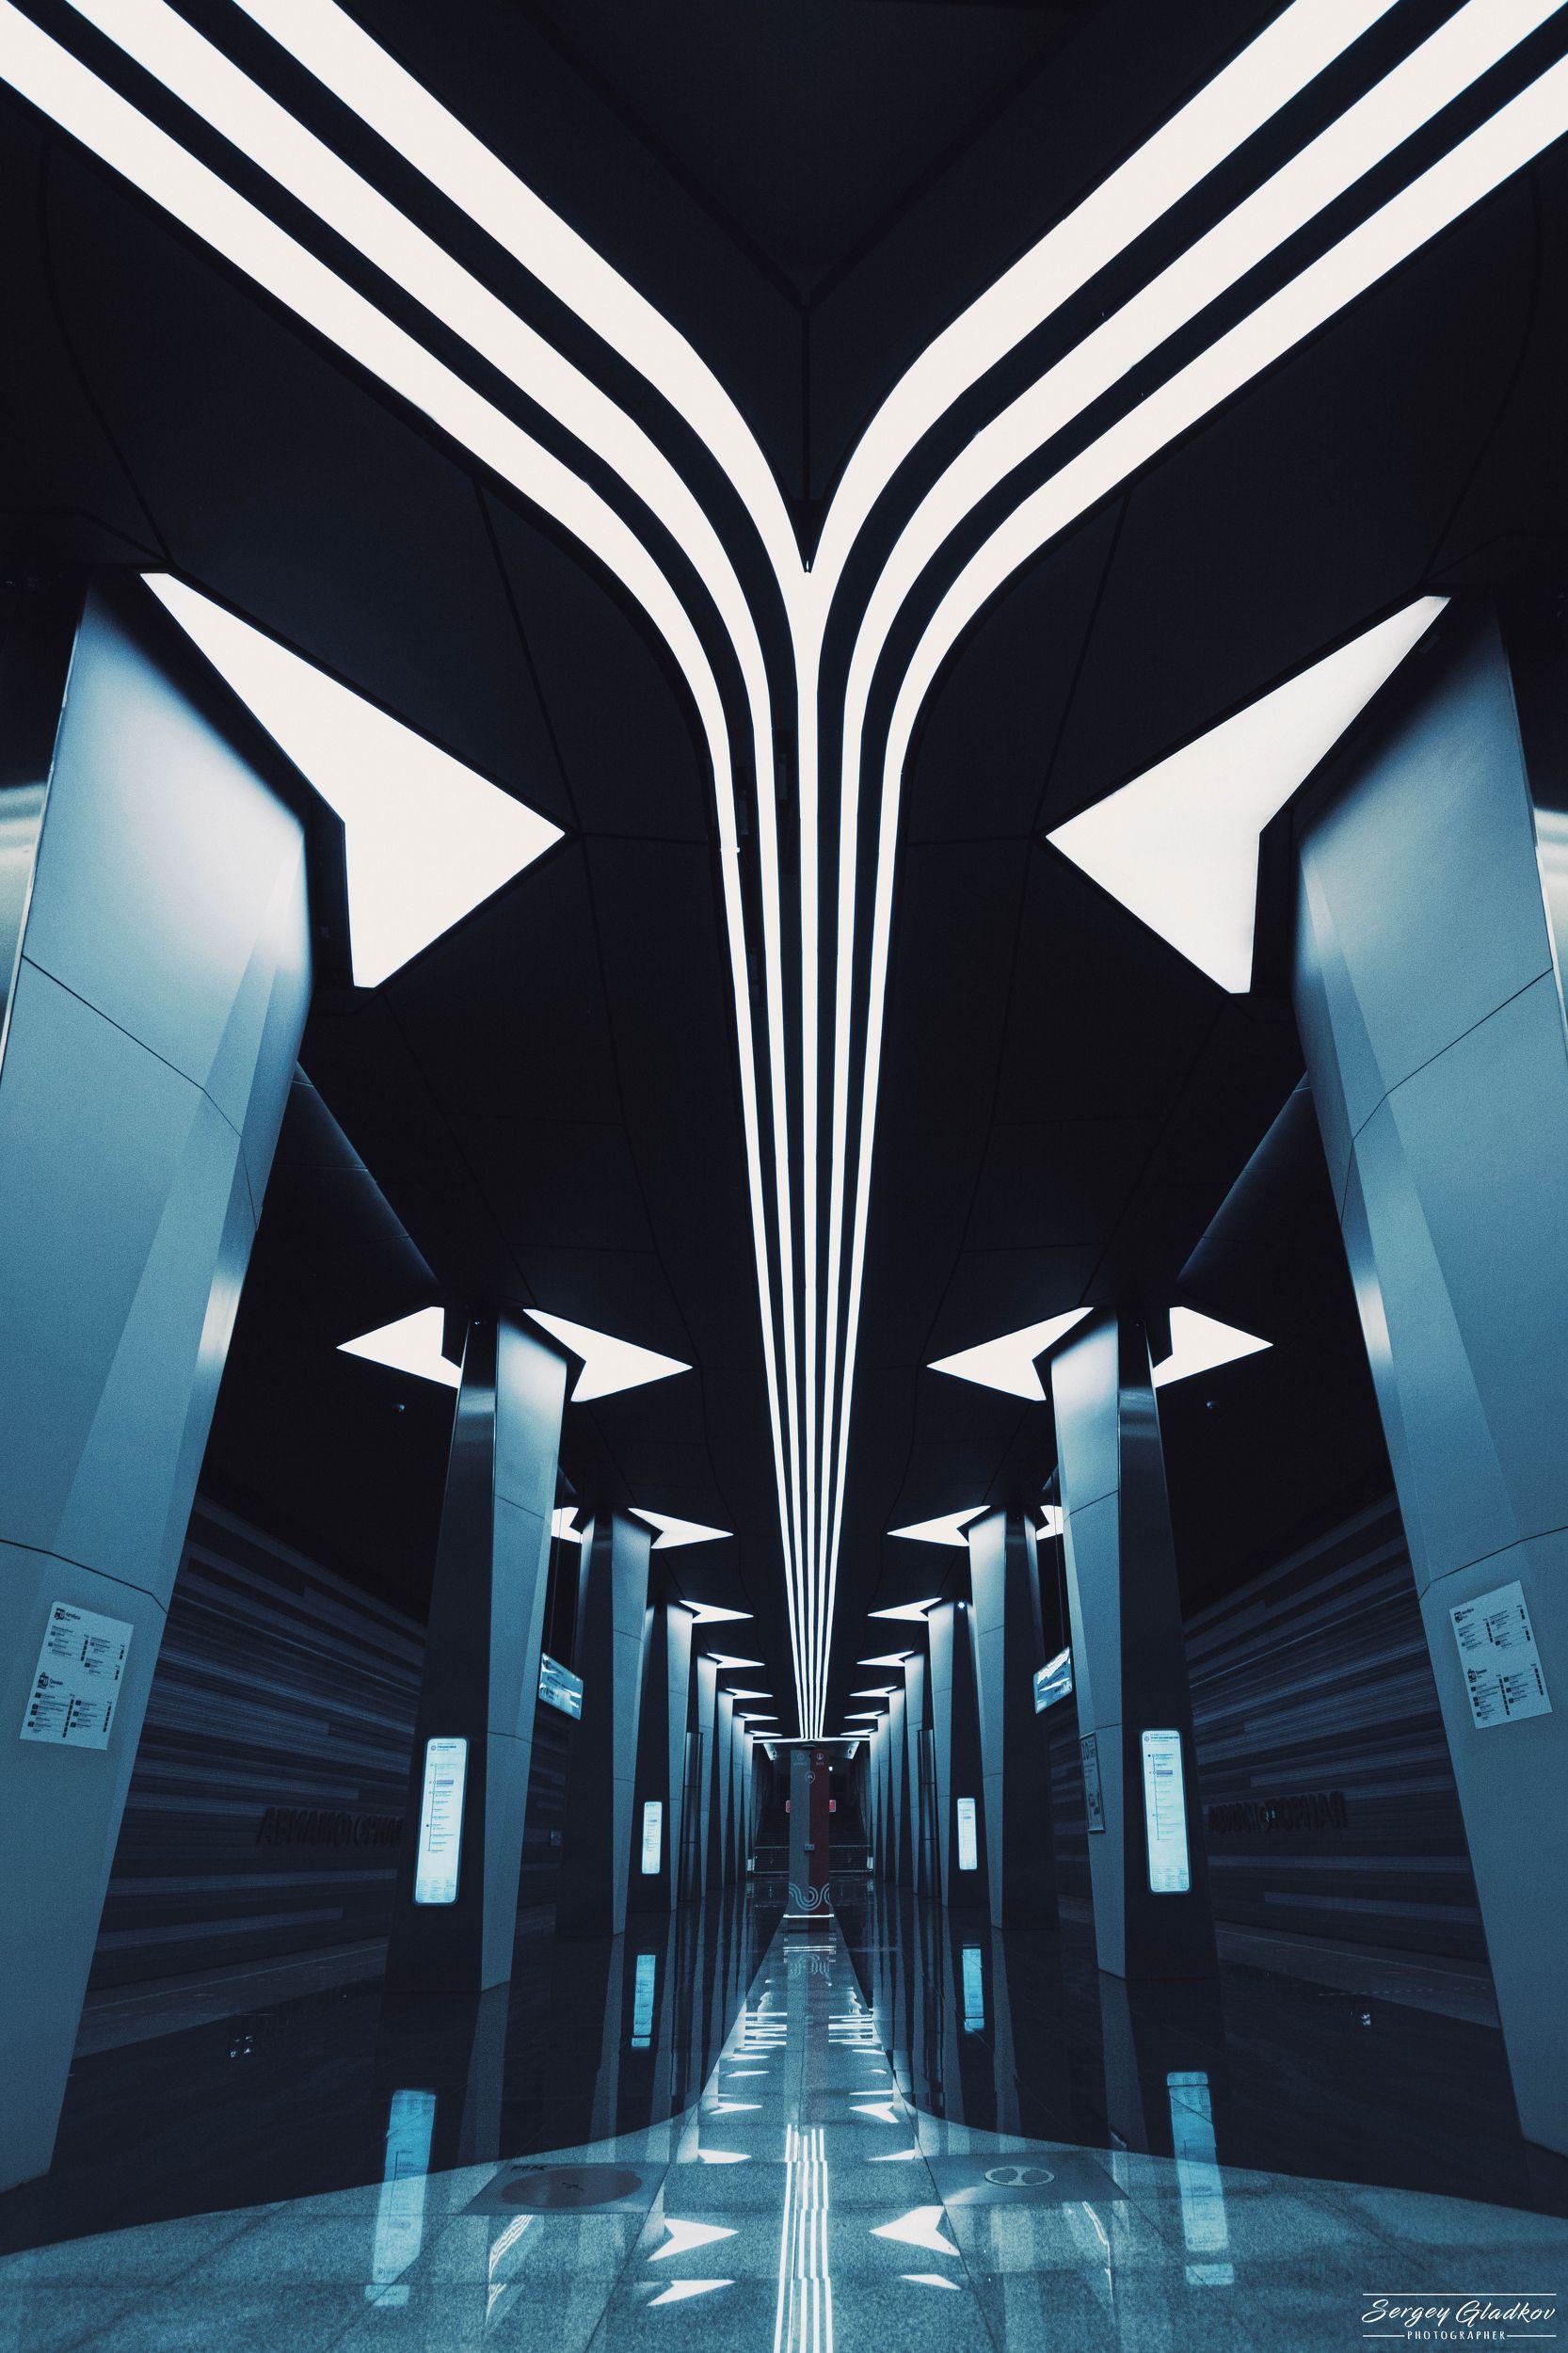 geometry, lines, subway, underground, metro, light, architecture, city, urban, Moscow, Russia , Гладков Сергей